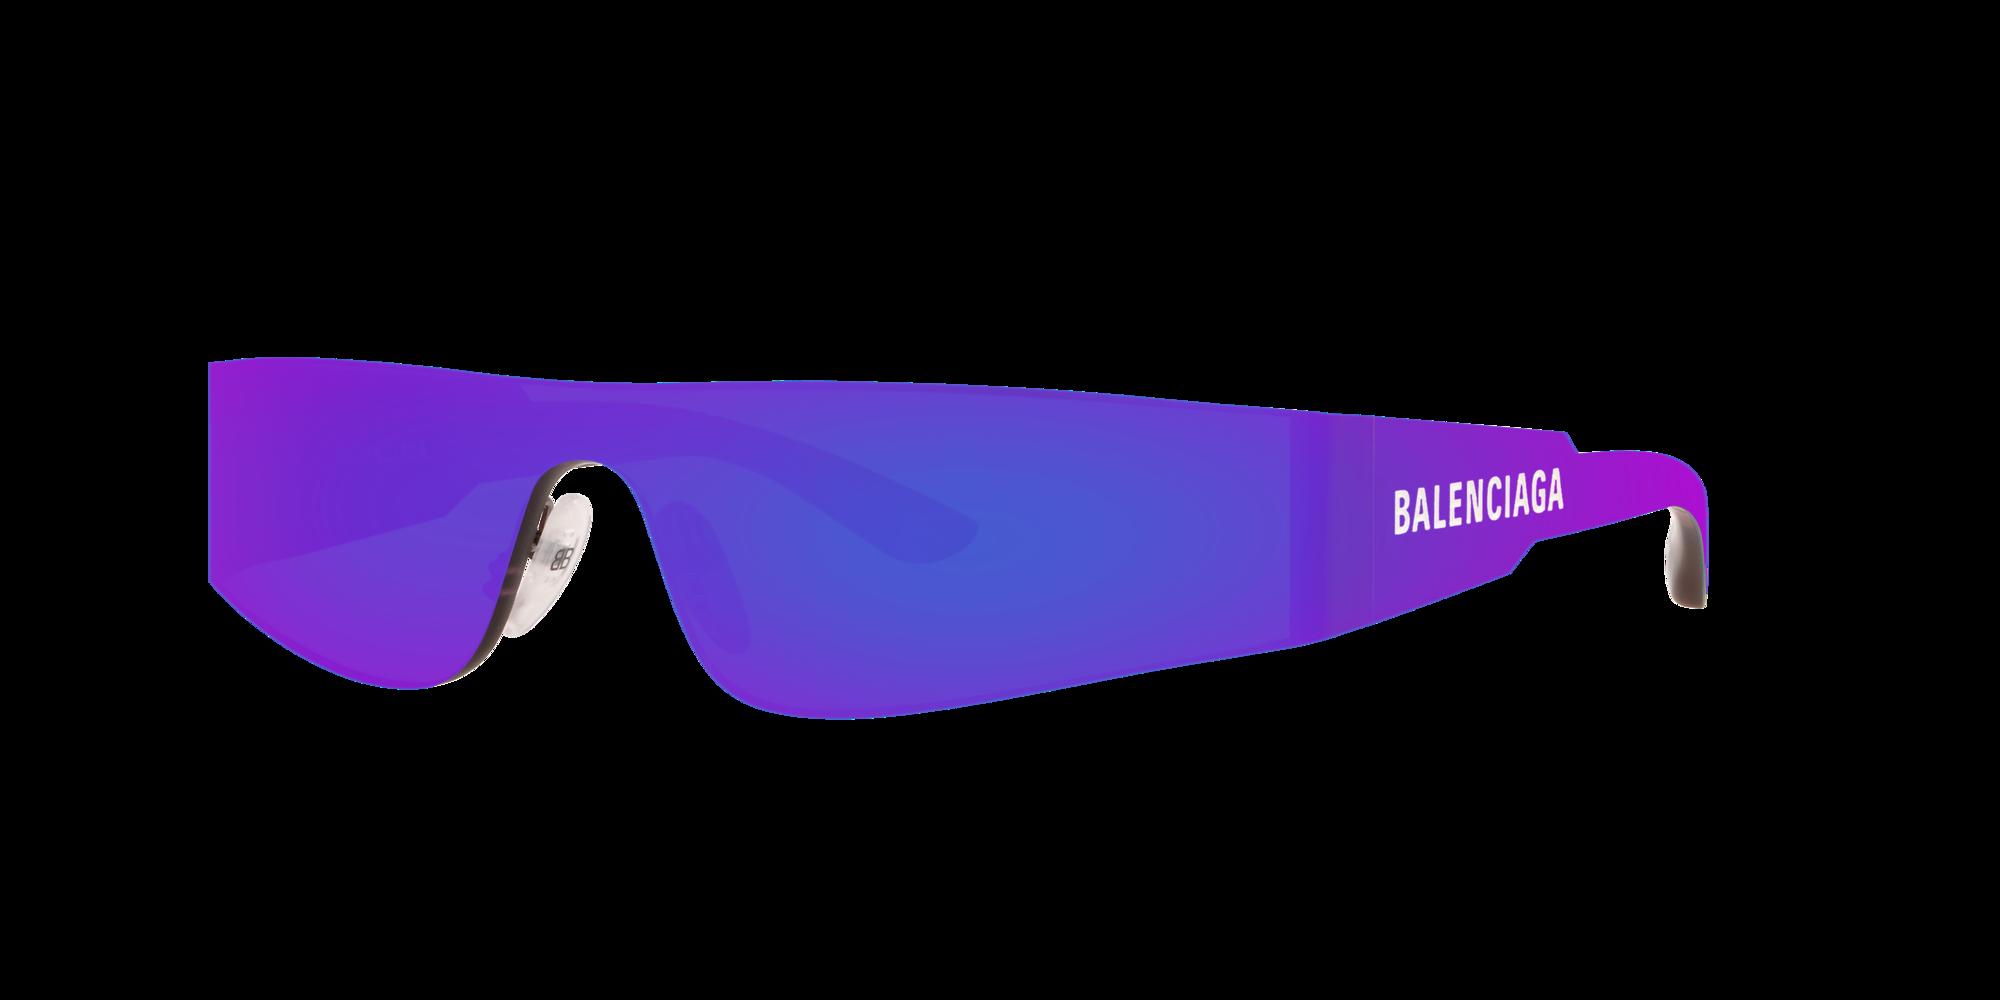 Balenciaga Unisex  6E000192 -  Frame color: Violet, Lens color: Violet